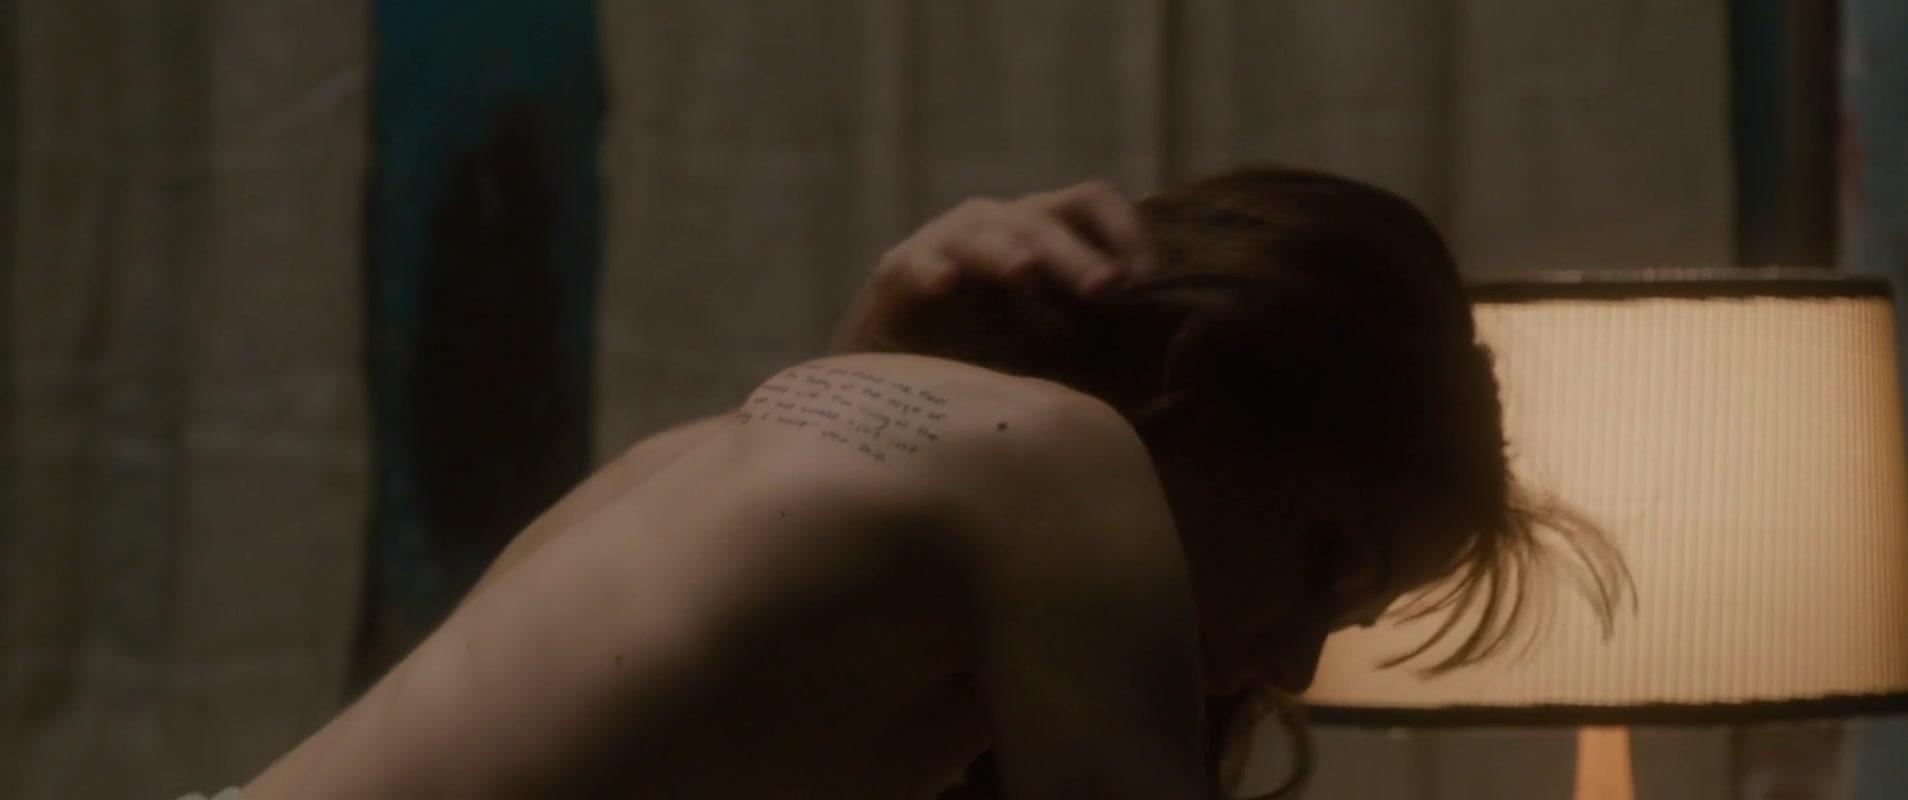 Analeigh Tipton Topless analeigh tipton sex scene - celebs roulette tube